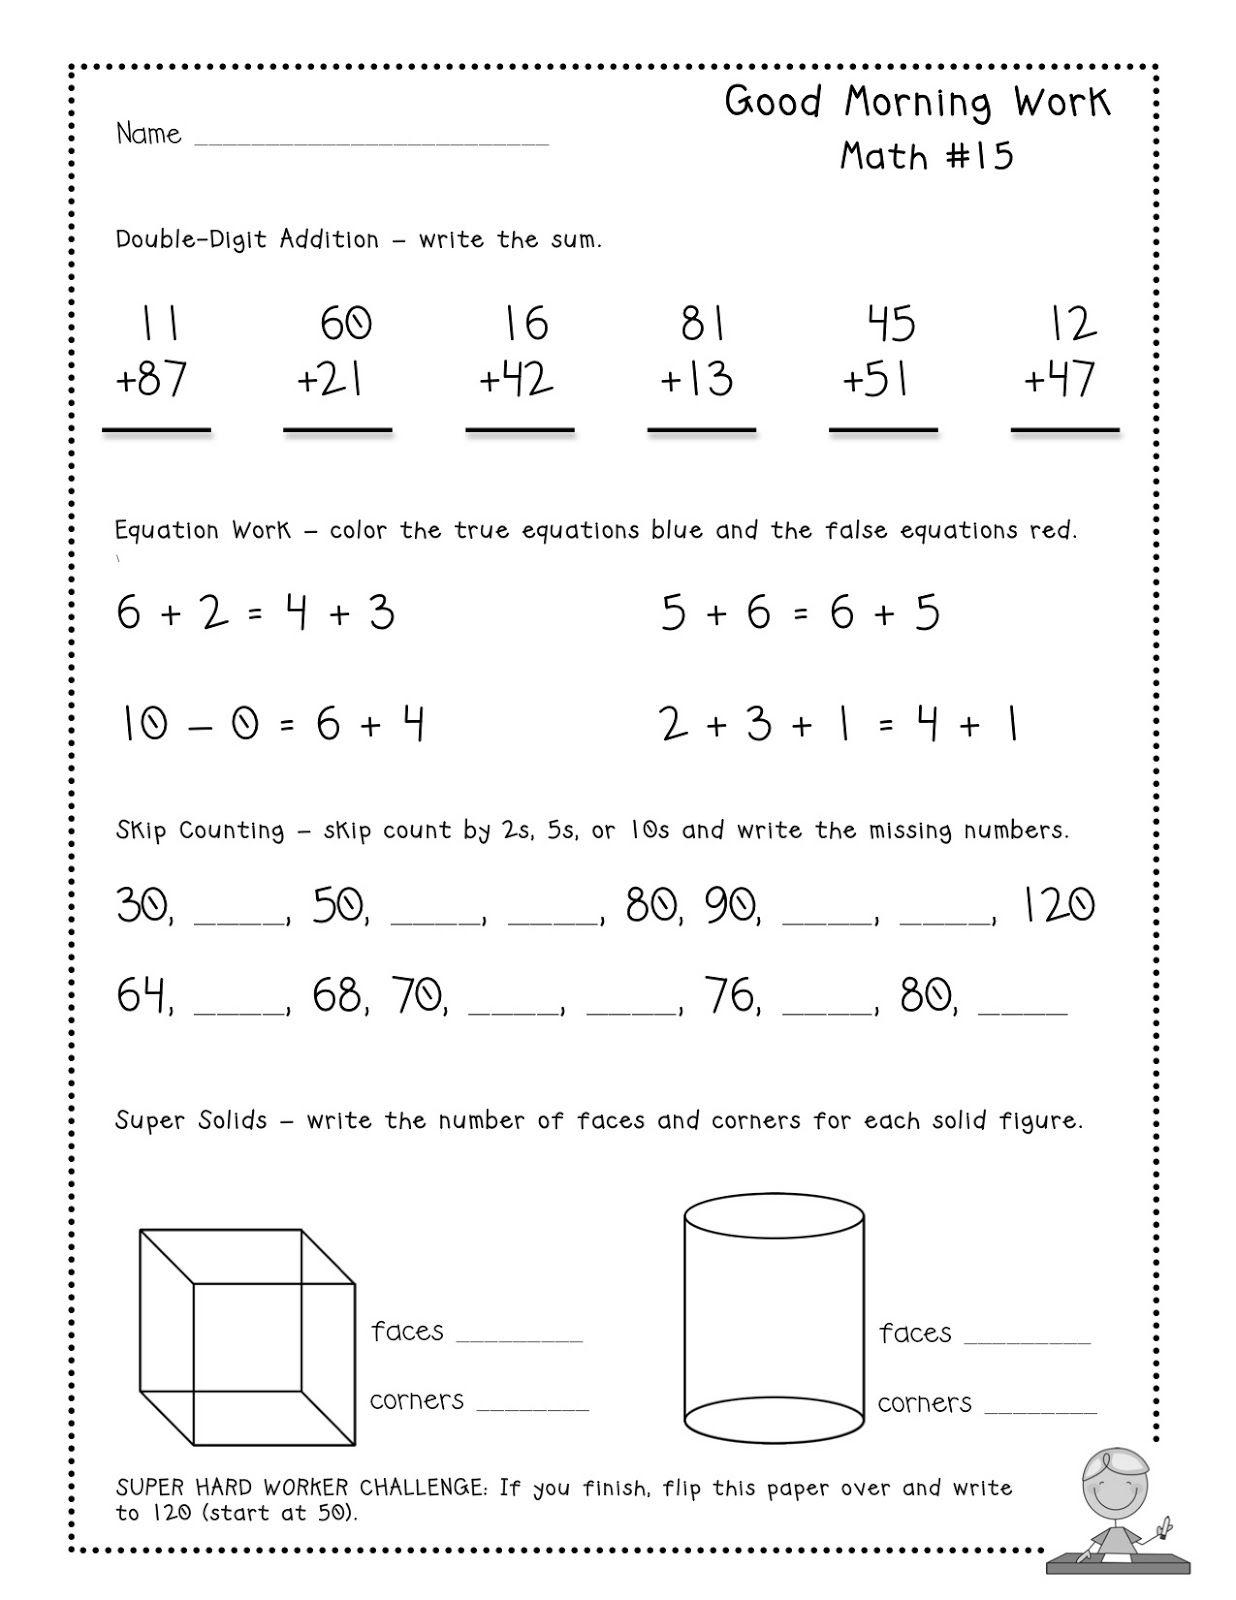 medium resolution of Teacher Idea Factory: MAY GOOD MORNING WORK + FREEBIE   Daily math